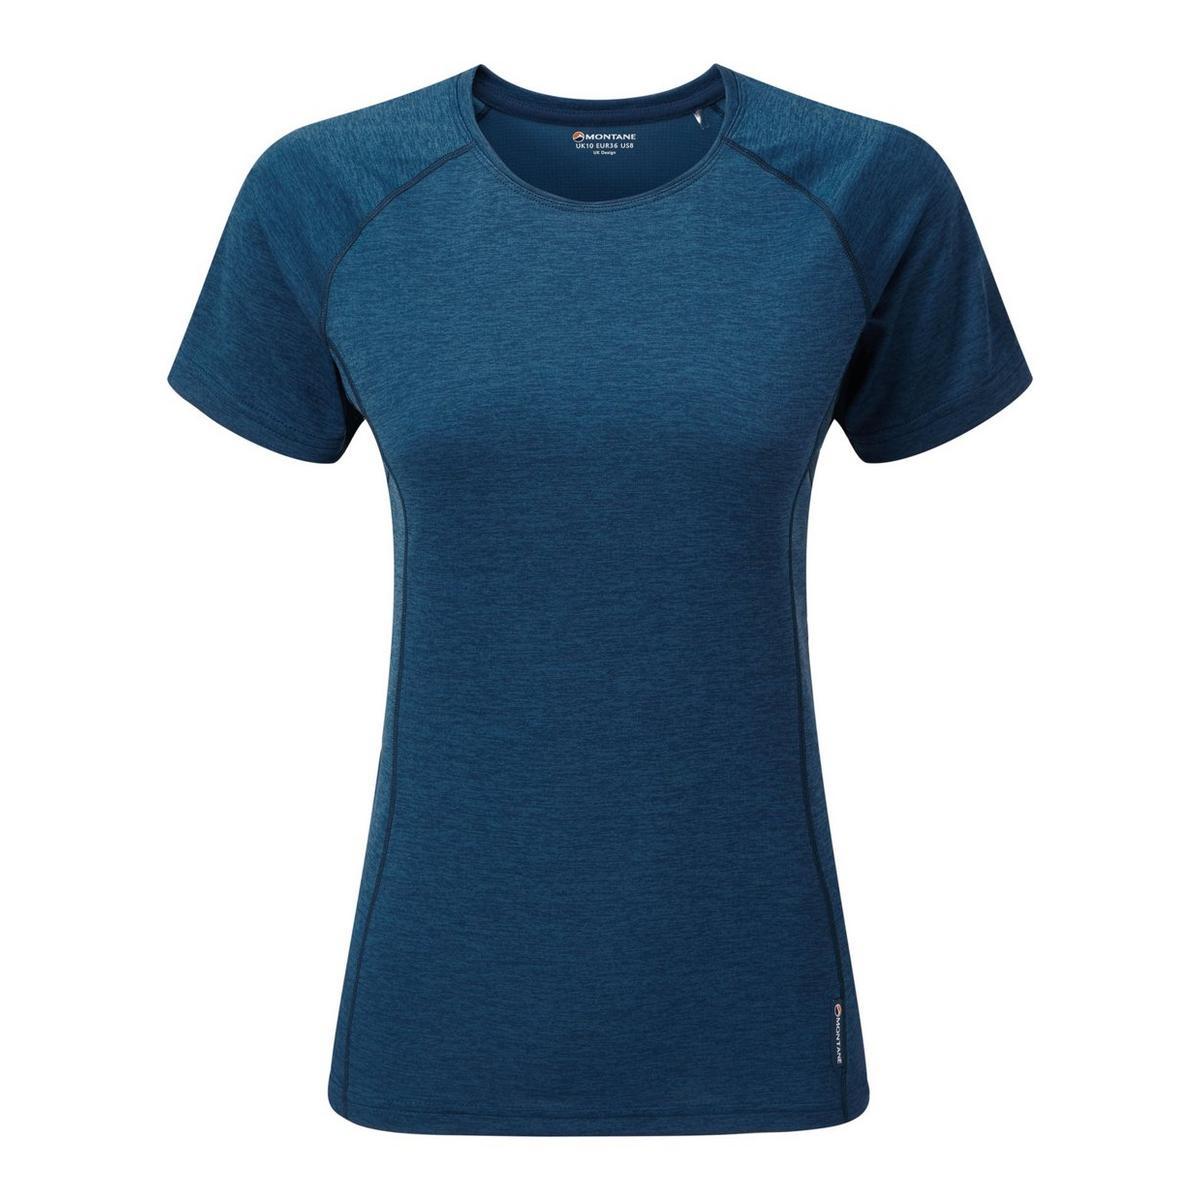 Montane Women's Dart T-Shirt - Navy